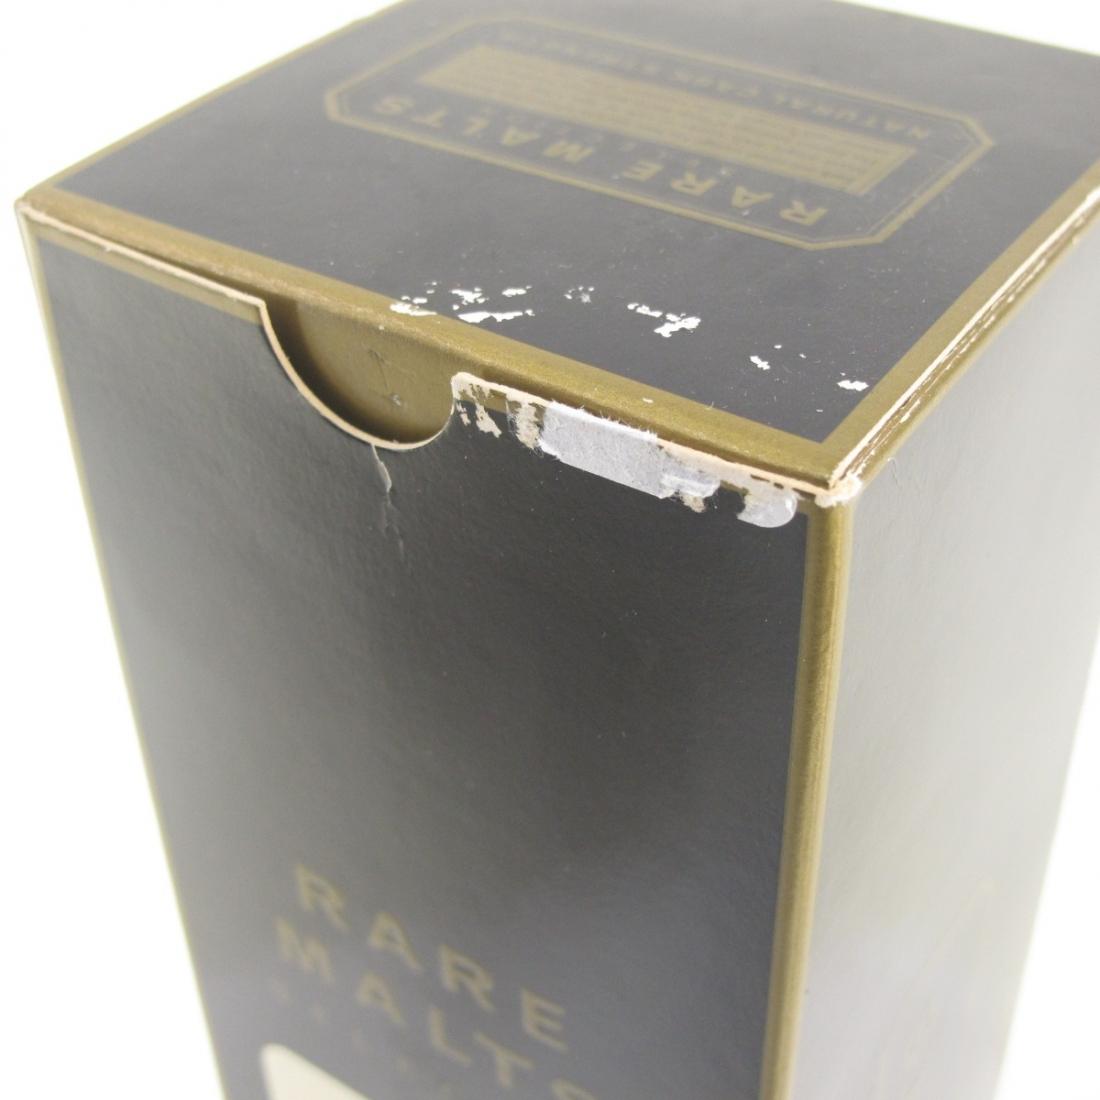 Benrinnes 1974 Rare Malt 21 Year Old / 60.4%